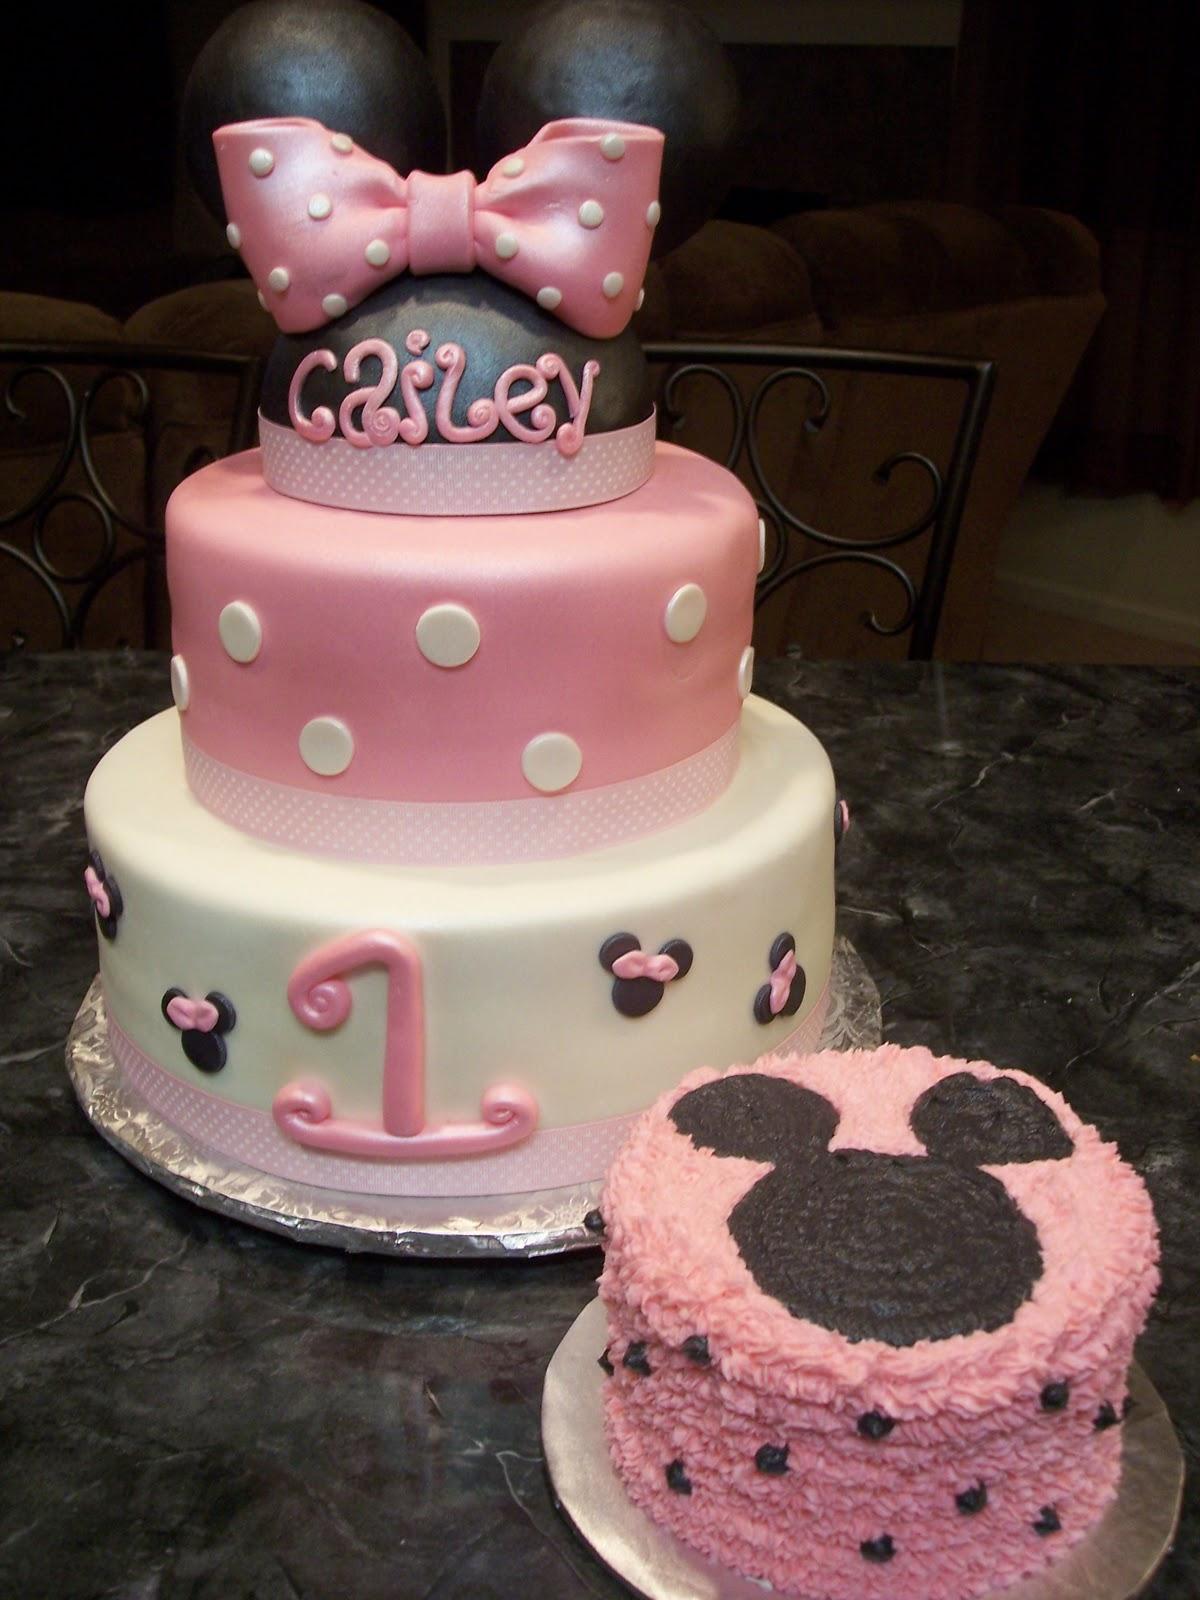 Mymonicakes Minnie Mouse Cake With Matching Smash Cake